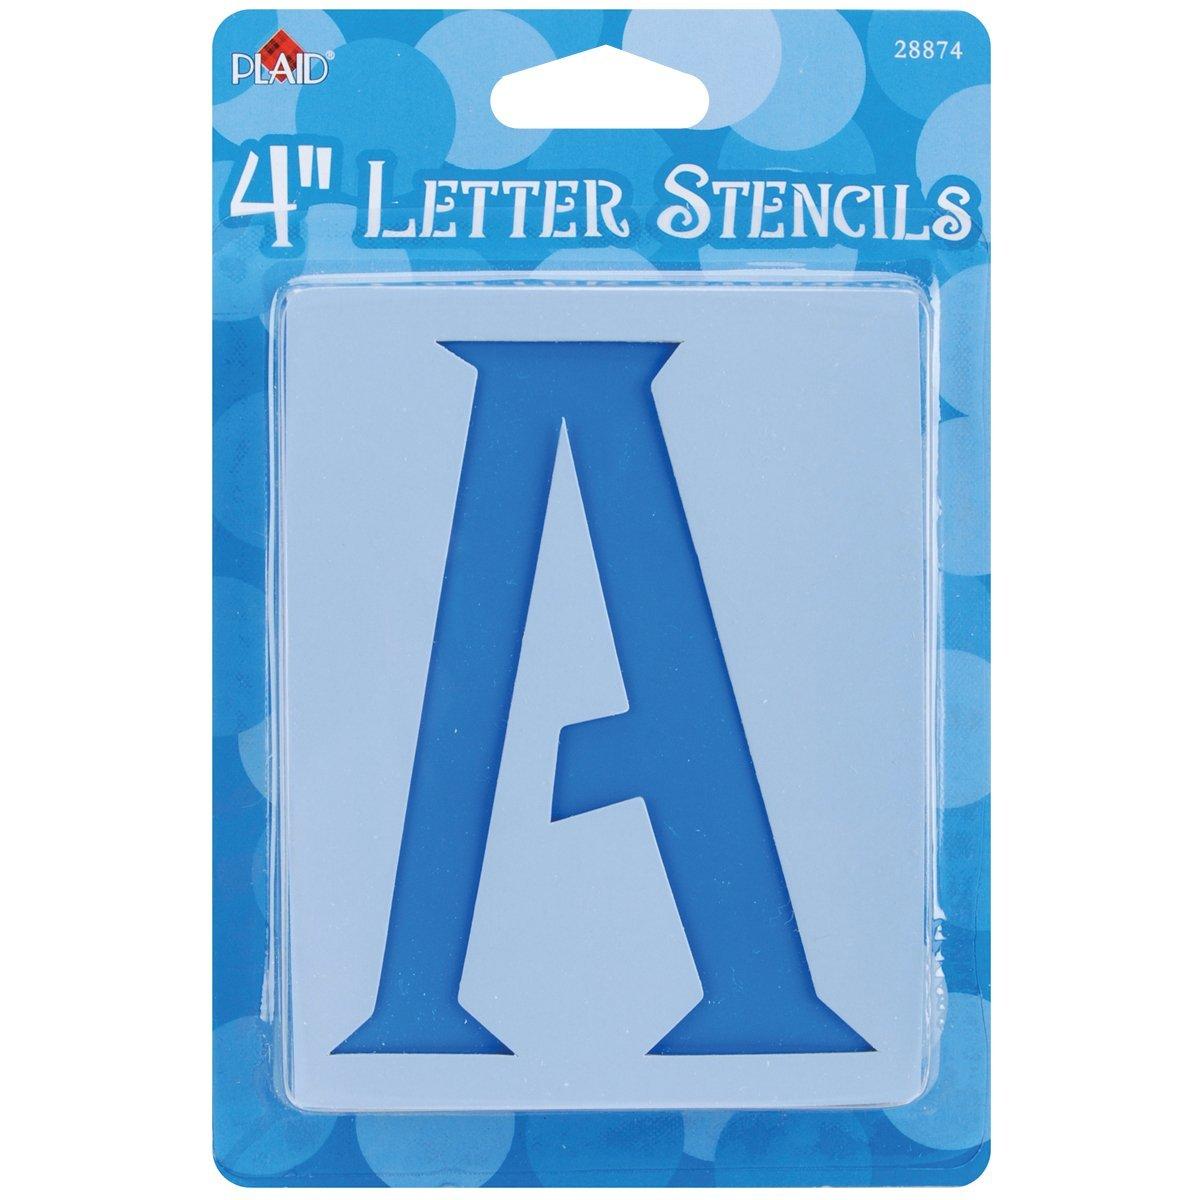 Plaid ® Stencils - Value Packs - Letter Stencils - Genie, 4